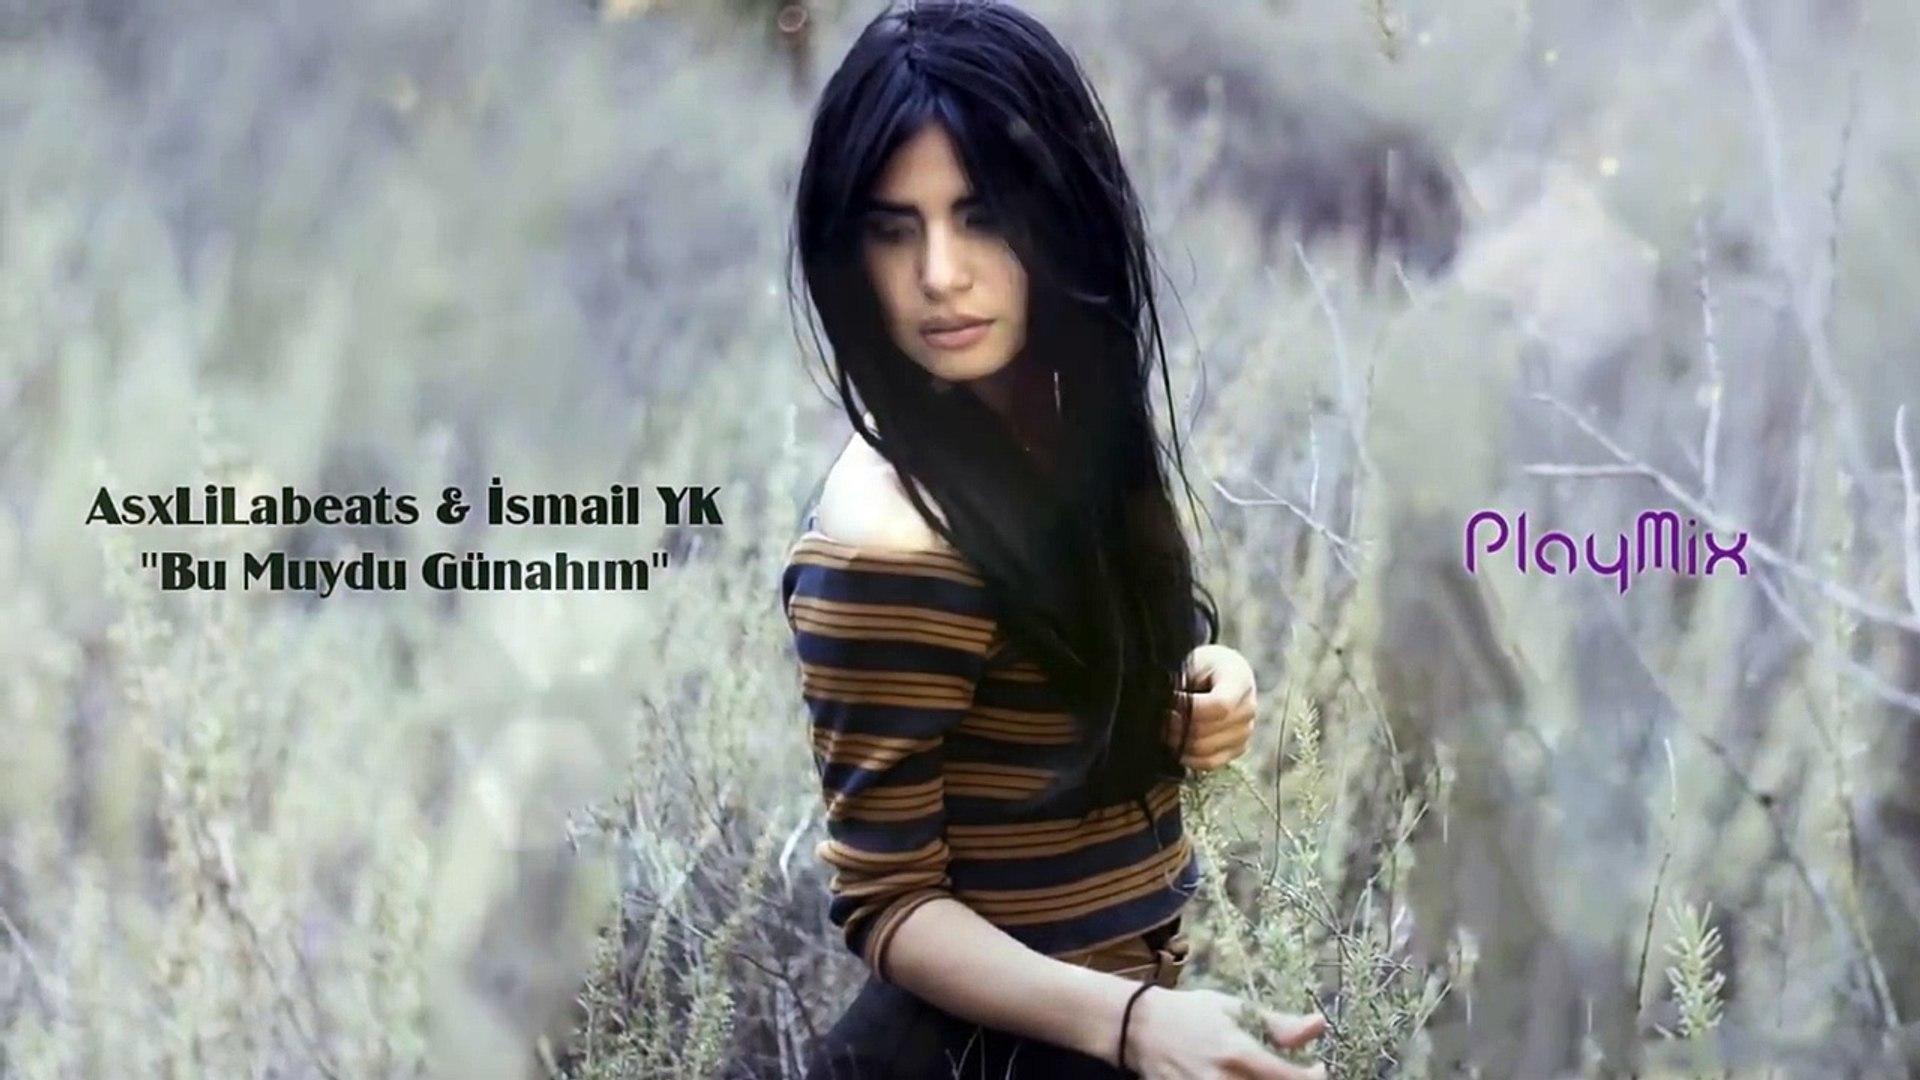 Bu Muydu Gunahim Ismail Yk Musiqaa Blog